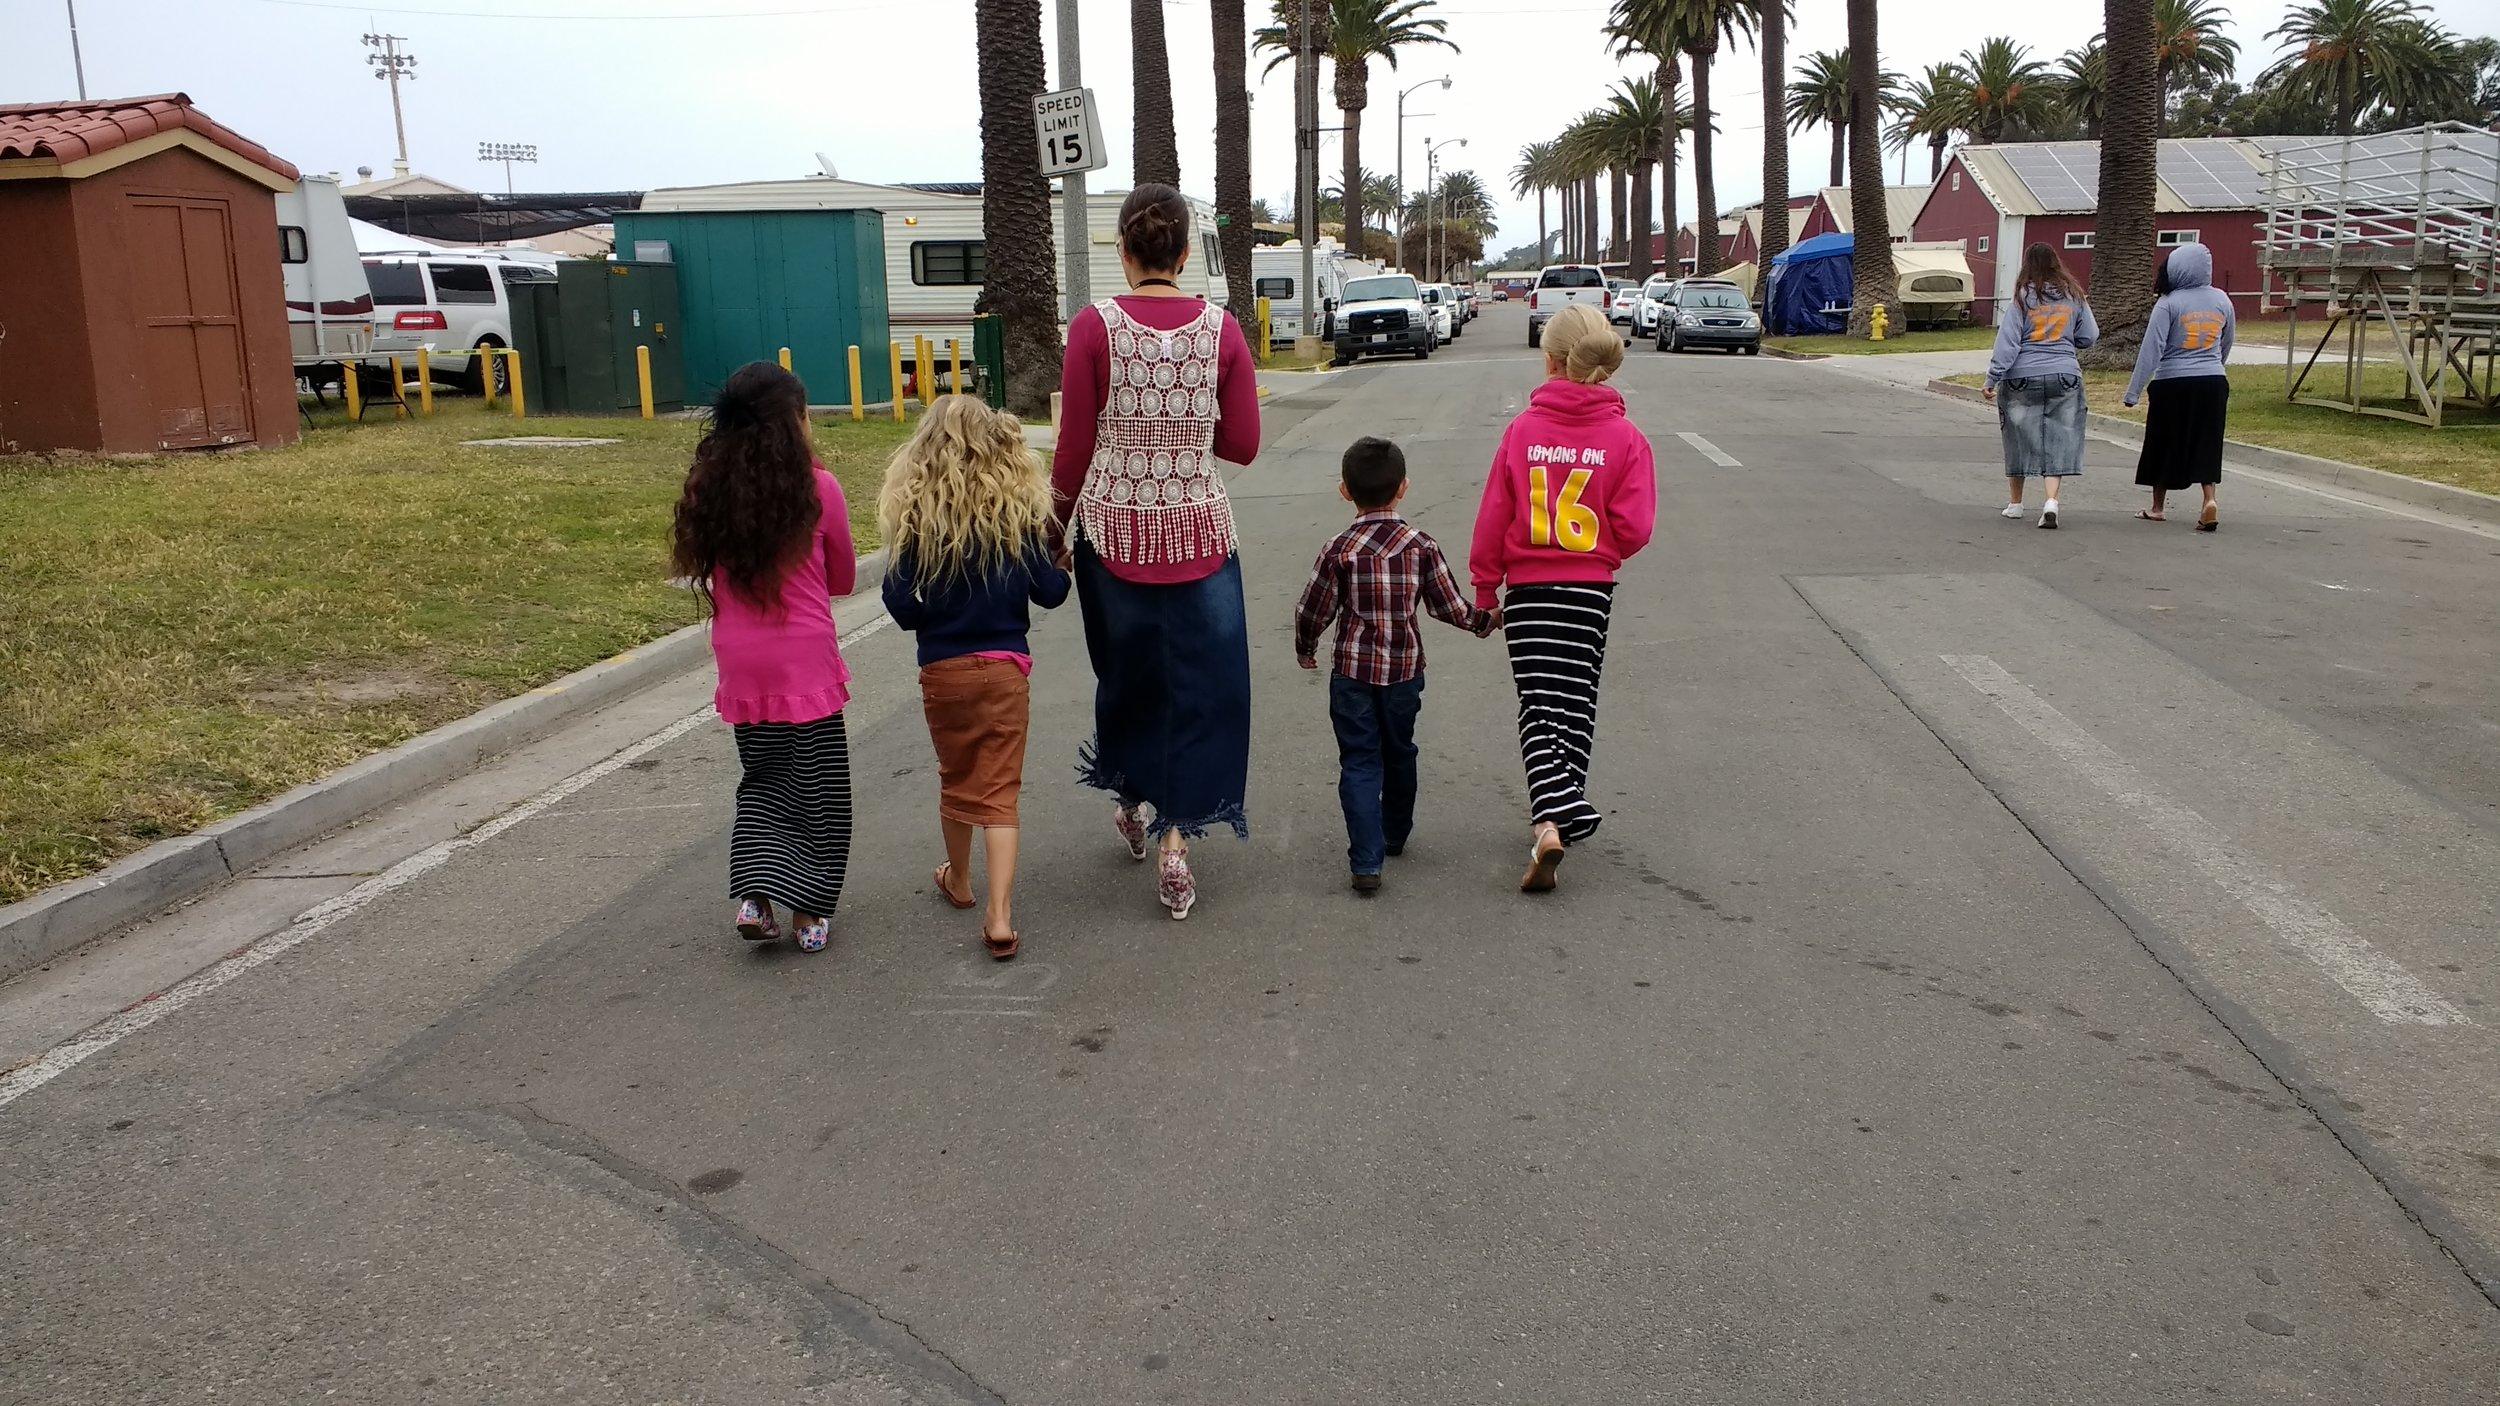 Jazlynn, Mandy, Jennifer, Jared and Emily